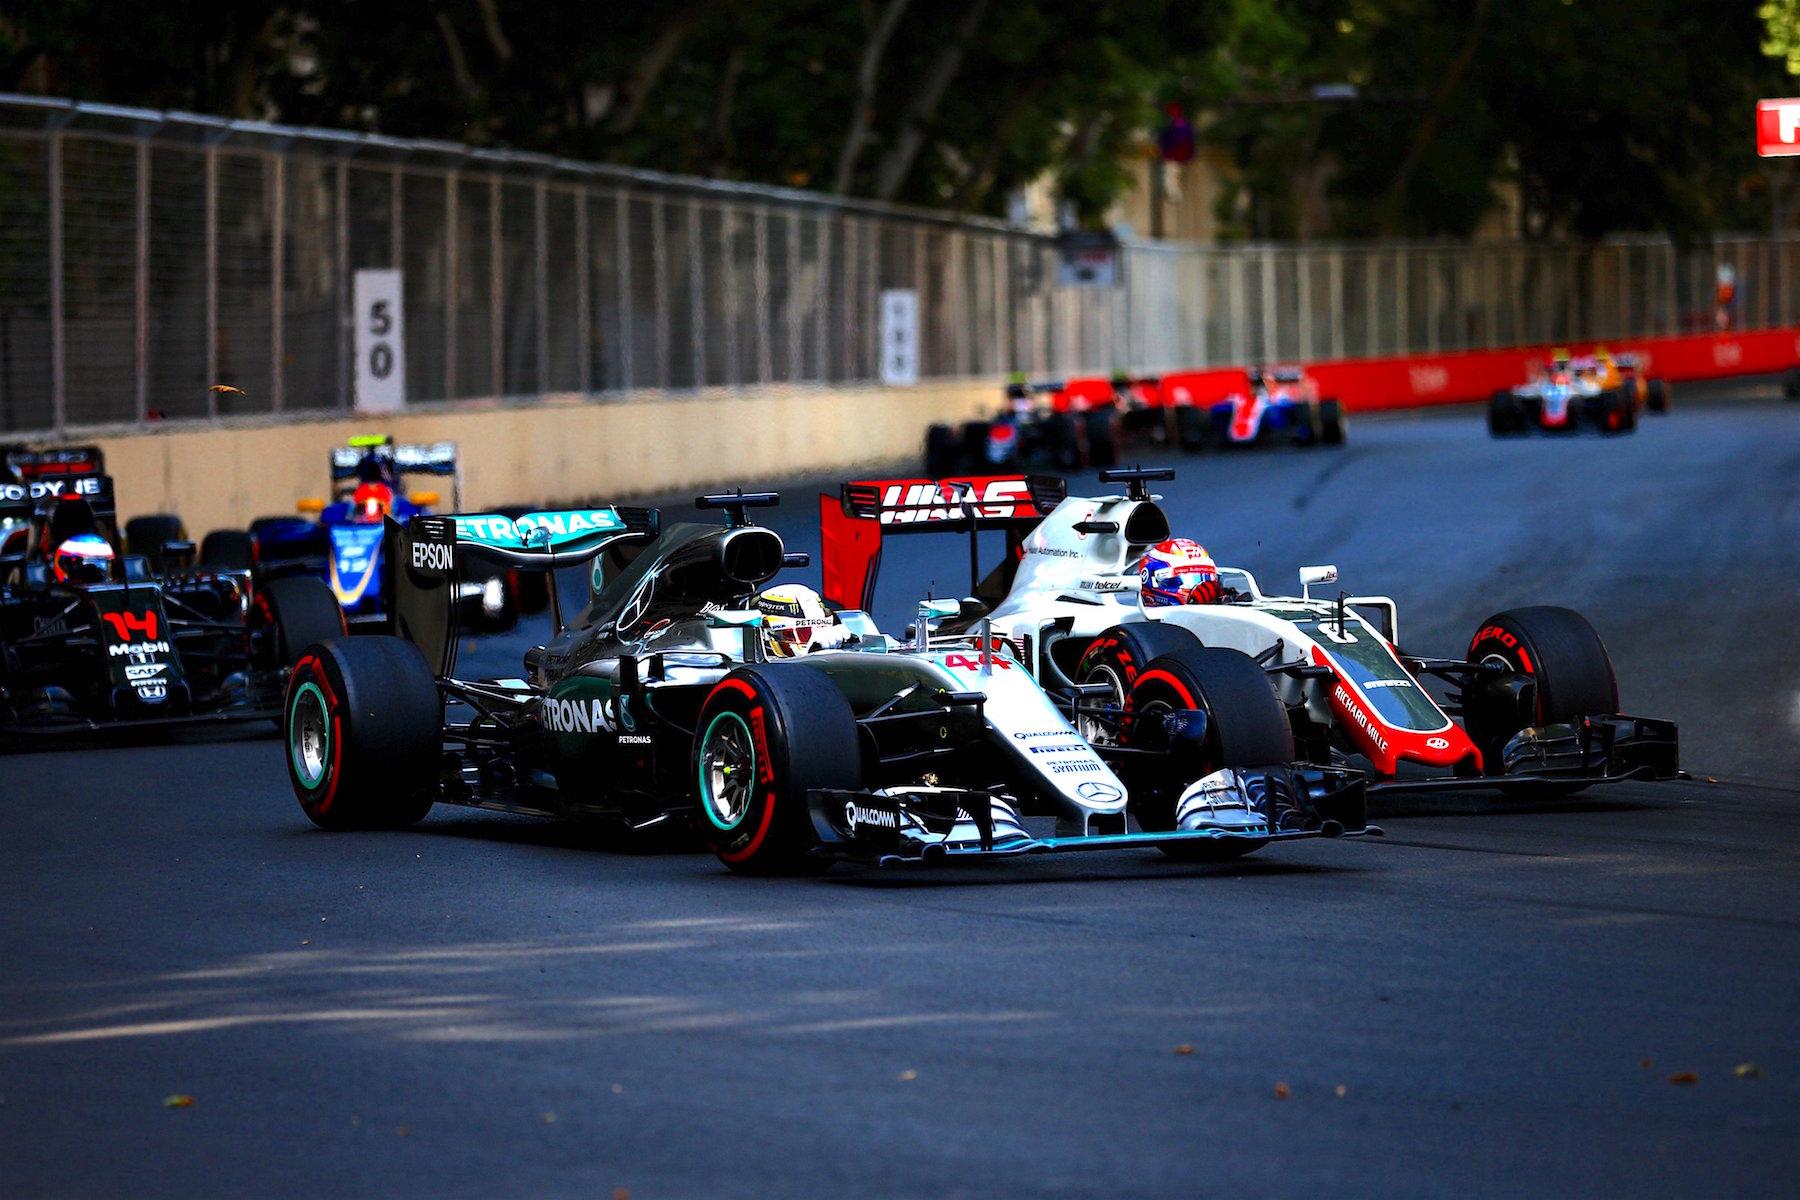 Salracing | Mercedes and Haas